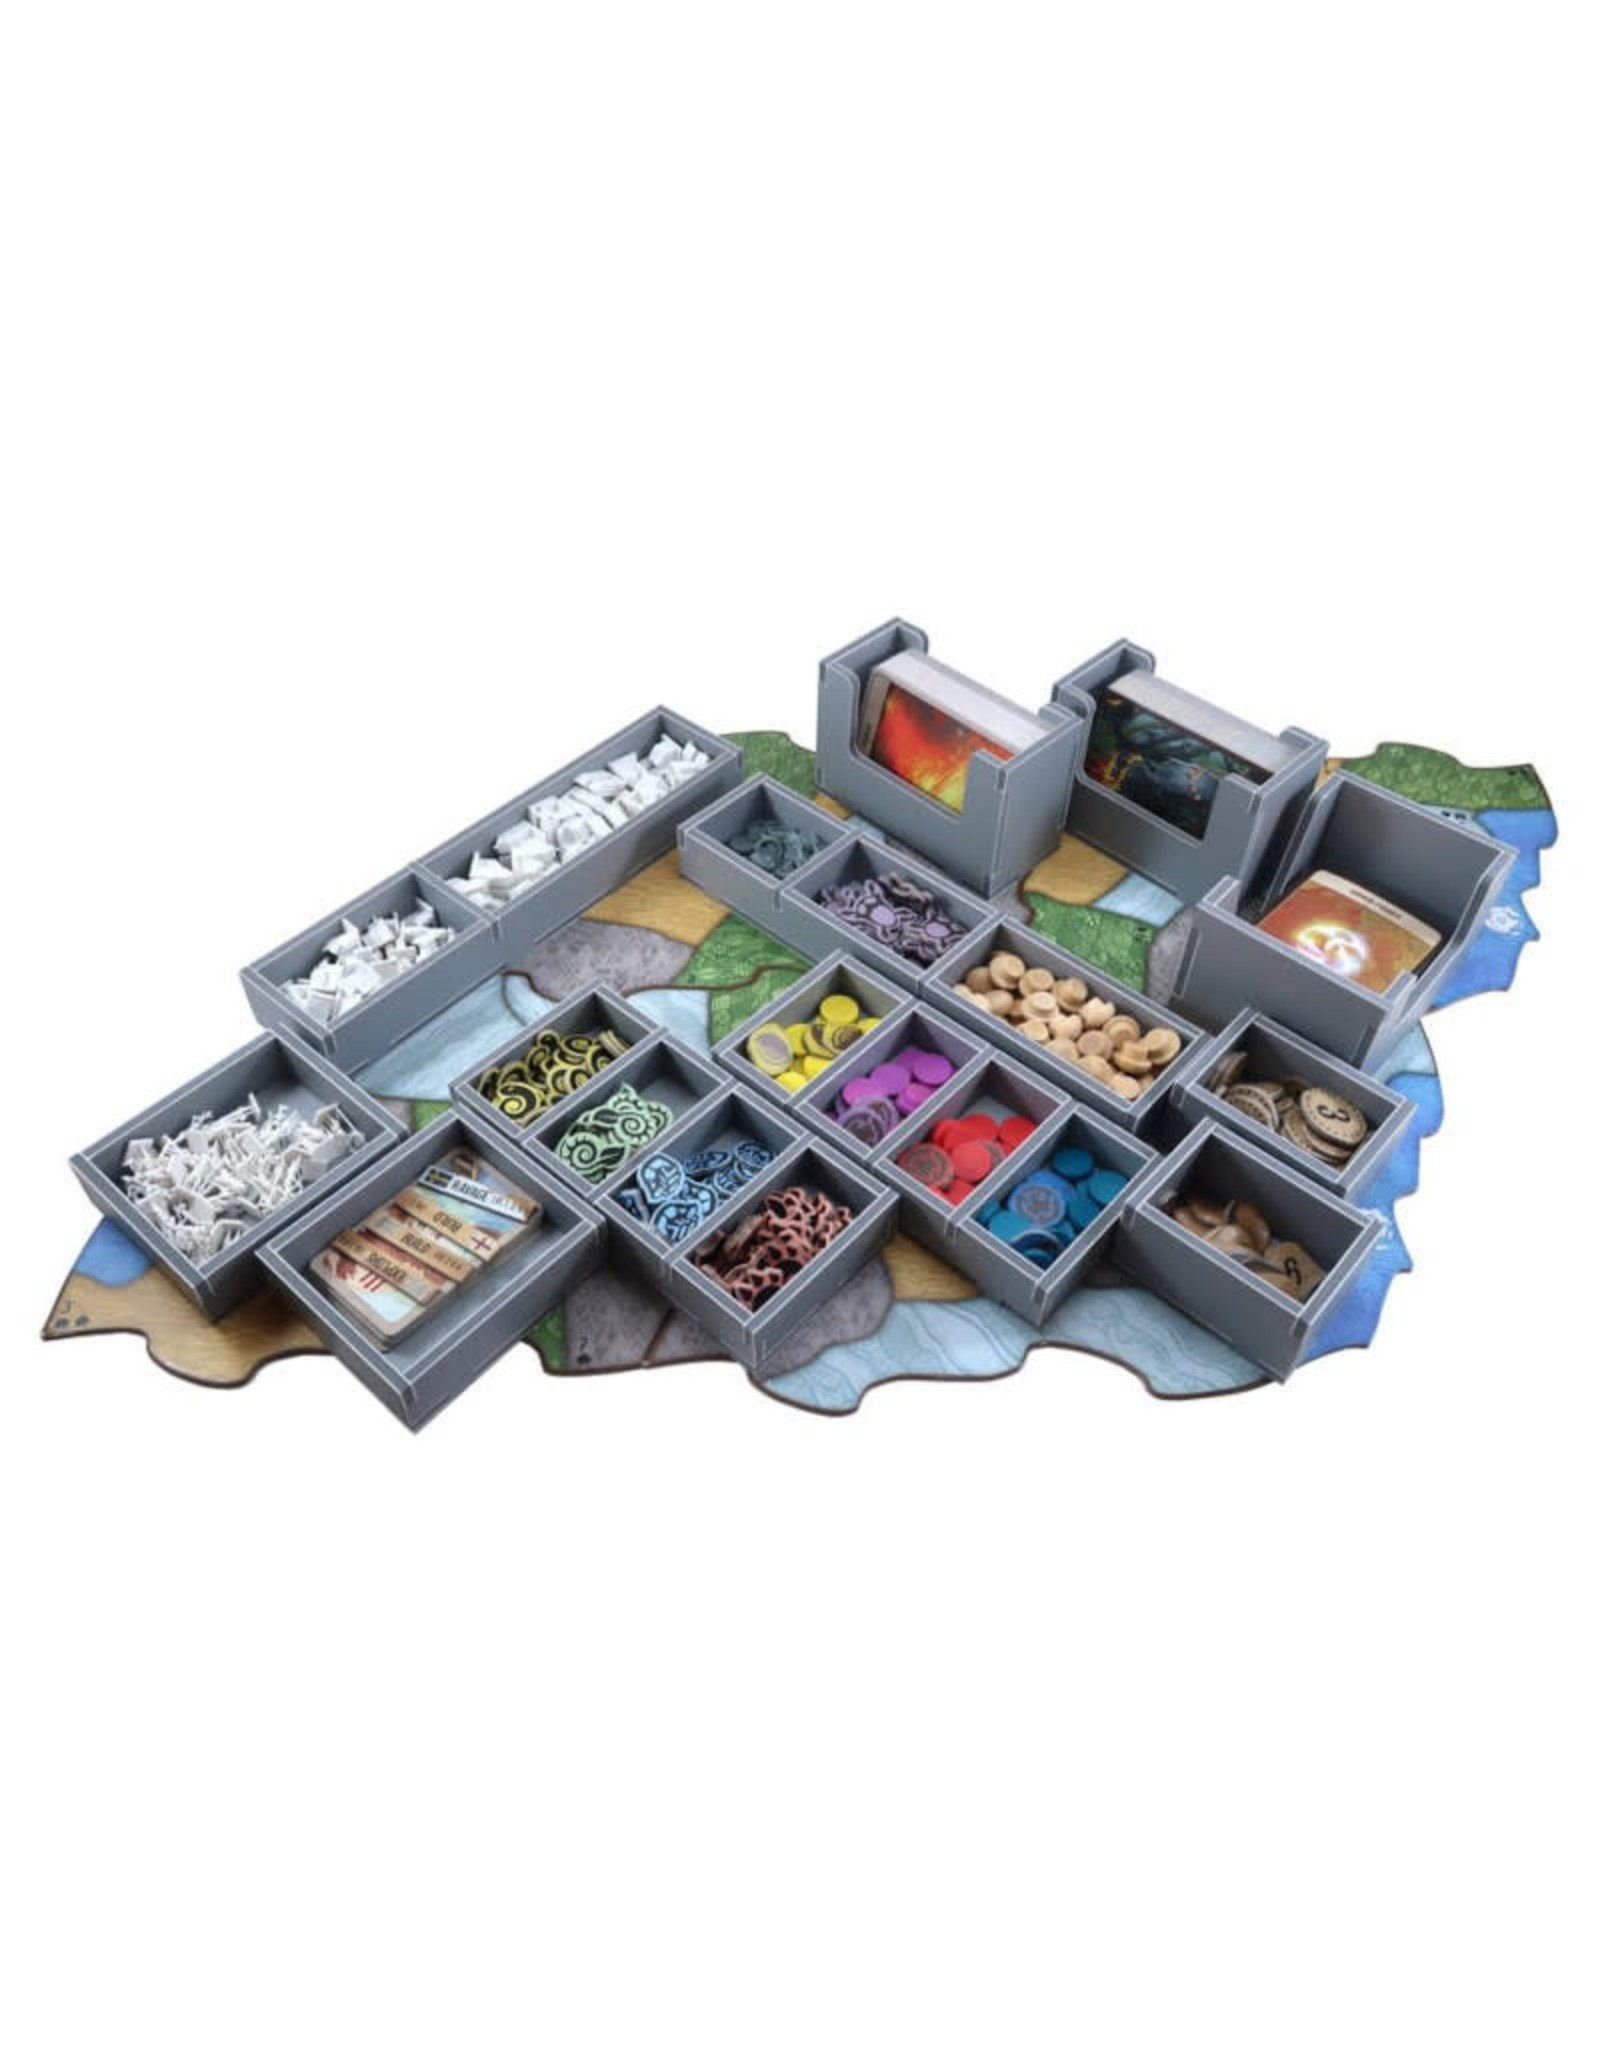 Folded Space Box Insert: Spirit Island or Jagged Earth